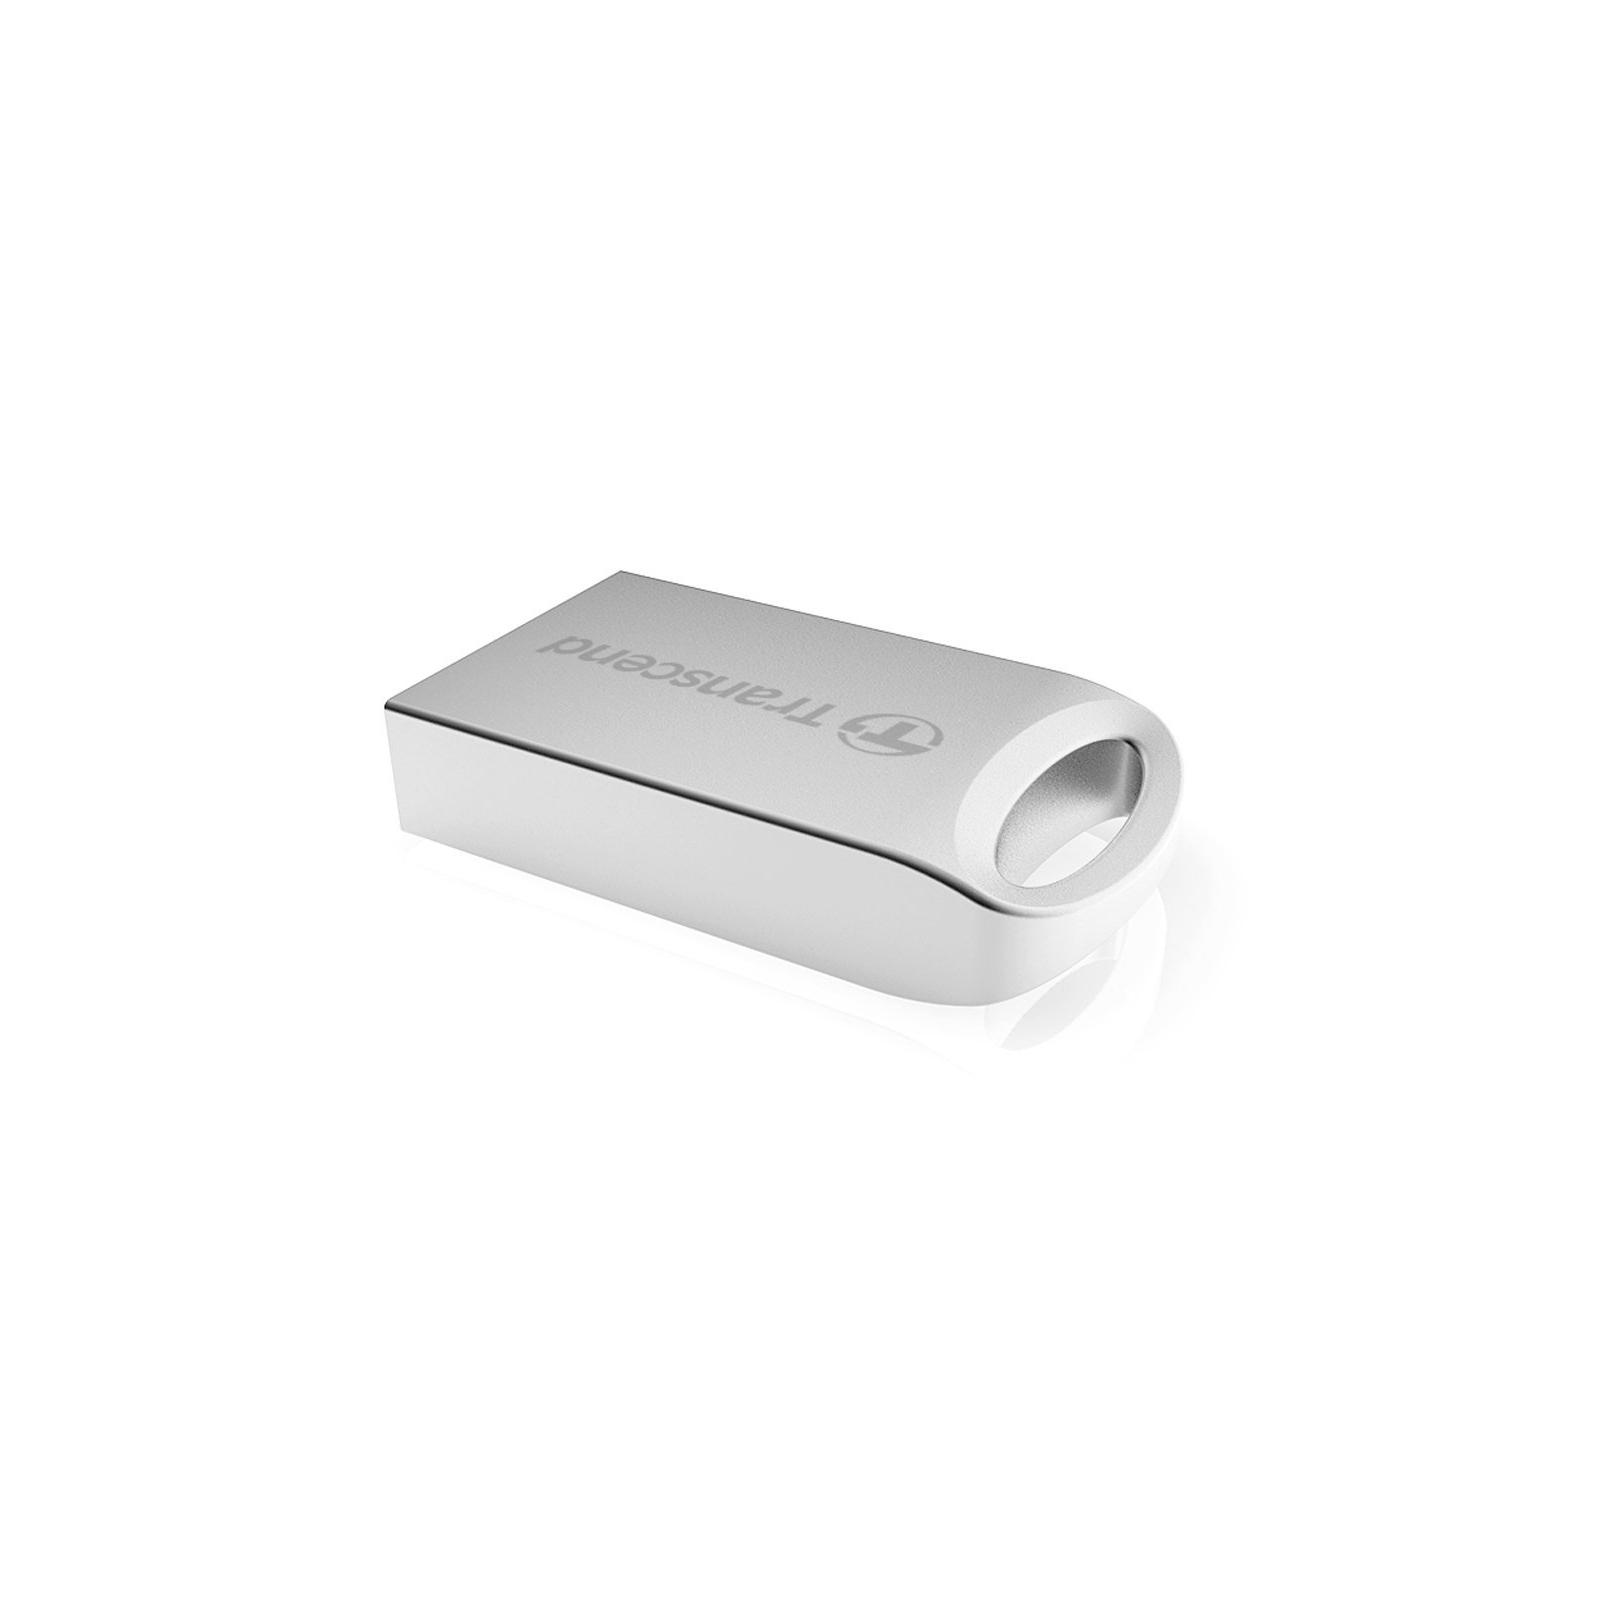 USB флеш накопитель Transcend JetFlash 510, Silver Plating (TS32GJF510S) изображение 2